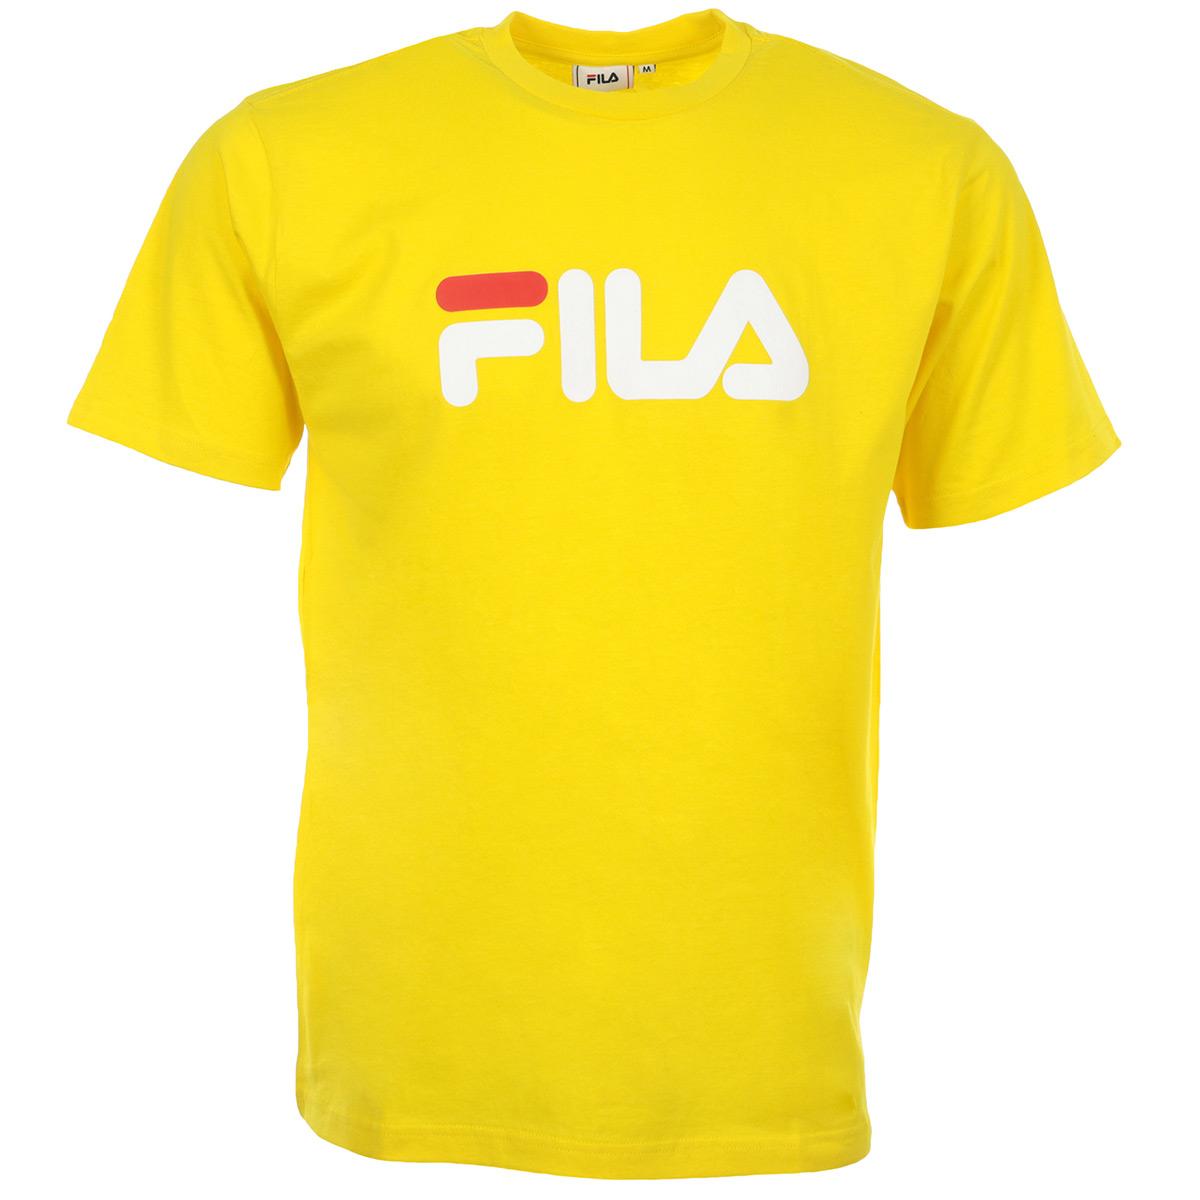 Vêtement T-Shirts Fila homme Talan Tee SS taille Blanc Coton